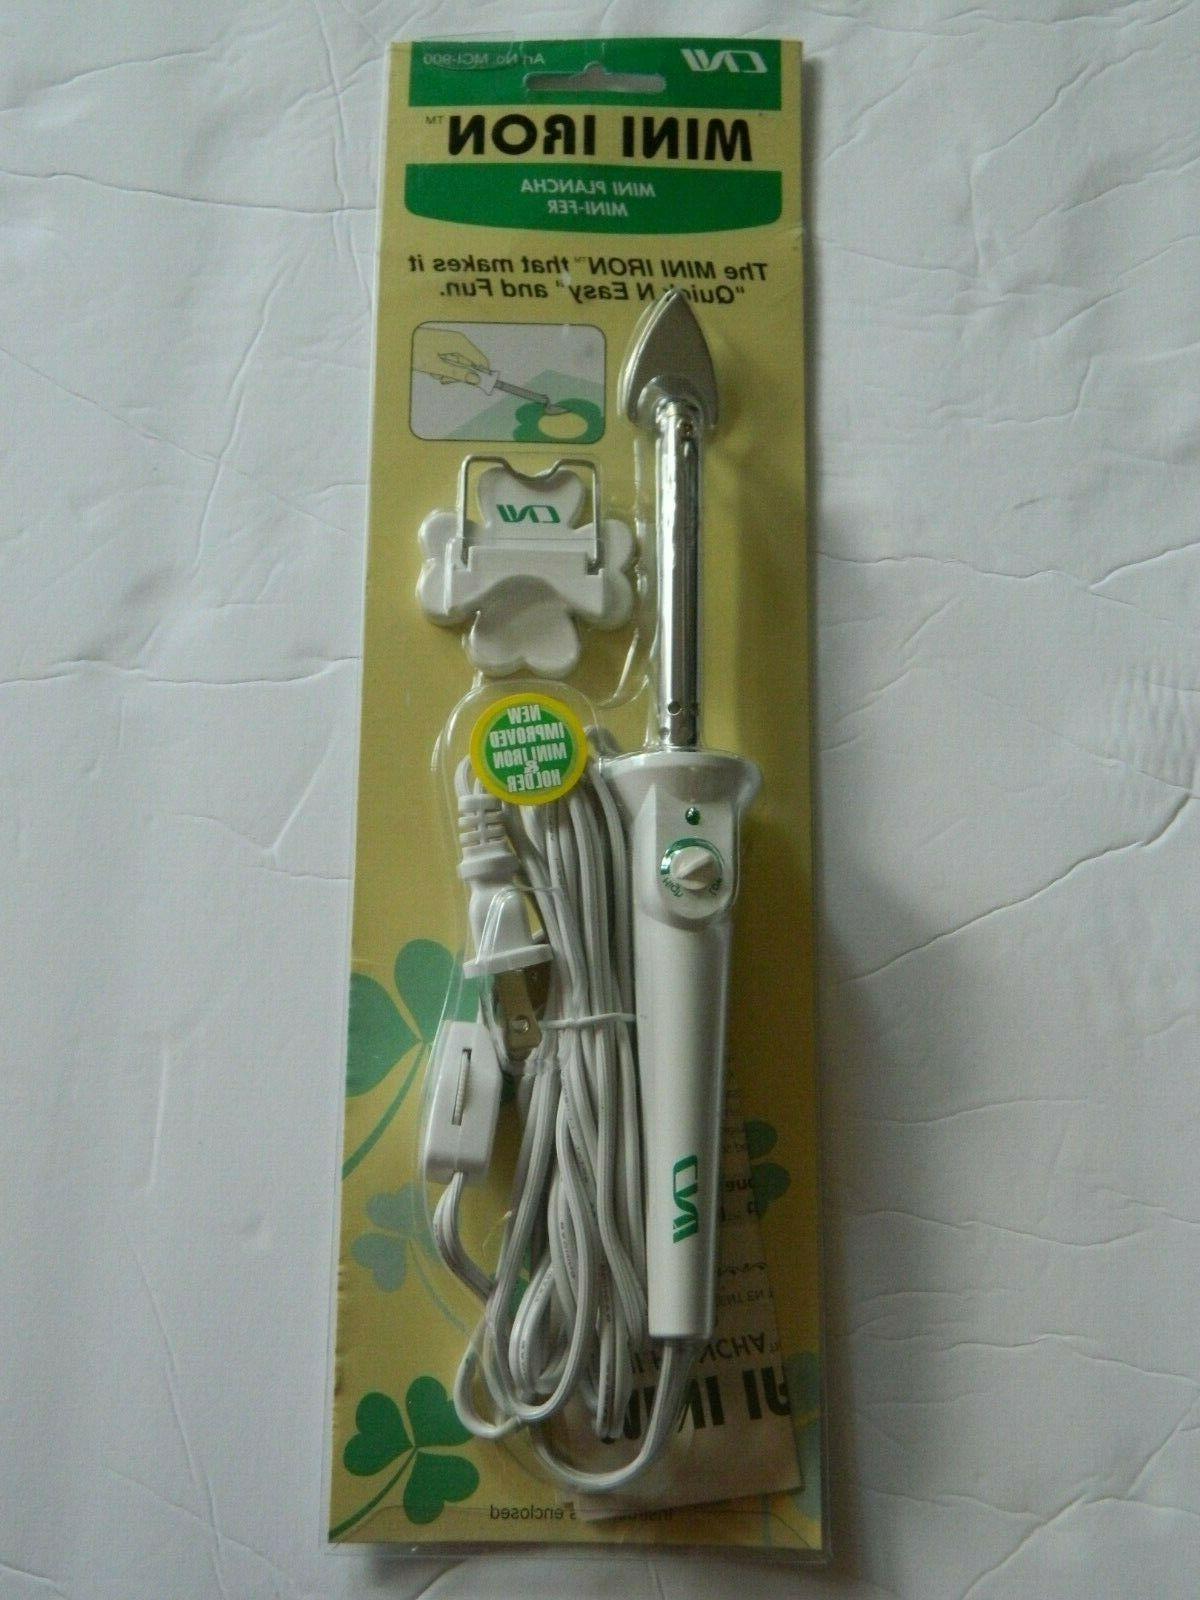 new clover needlecraft mini iron mci 900